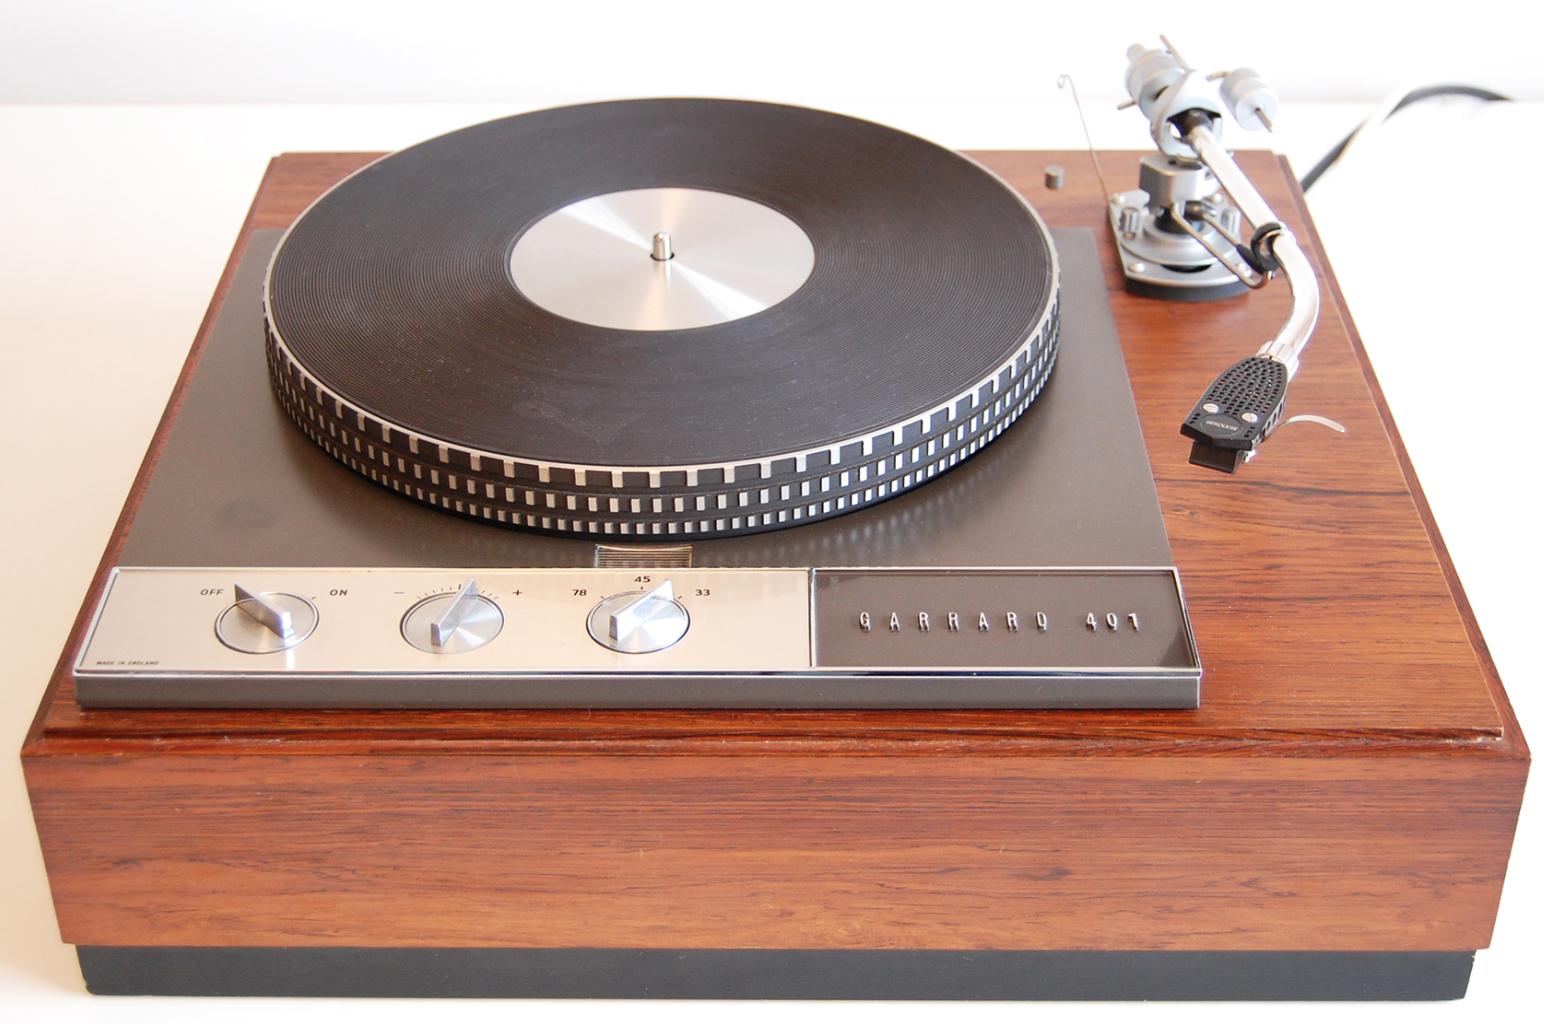 GARRARD & LORICRAFT ACQUIRED BY SME | Old Hi-Fi | Garrard turntable